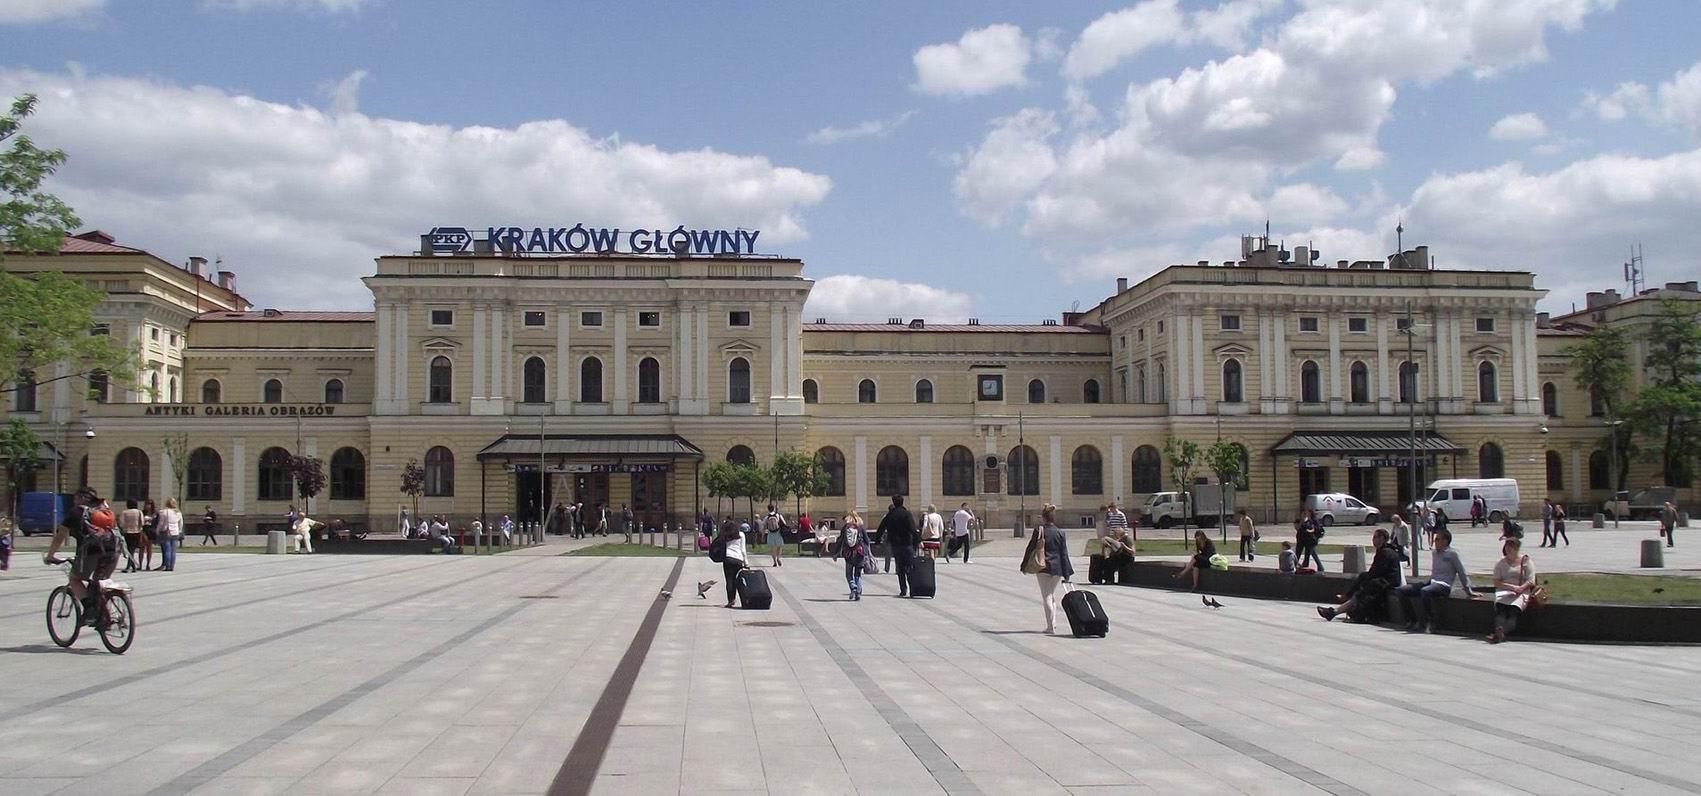 Главный вокзал Кракова